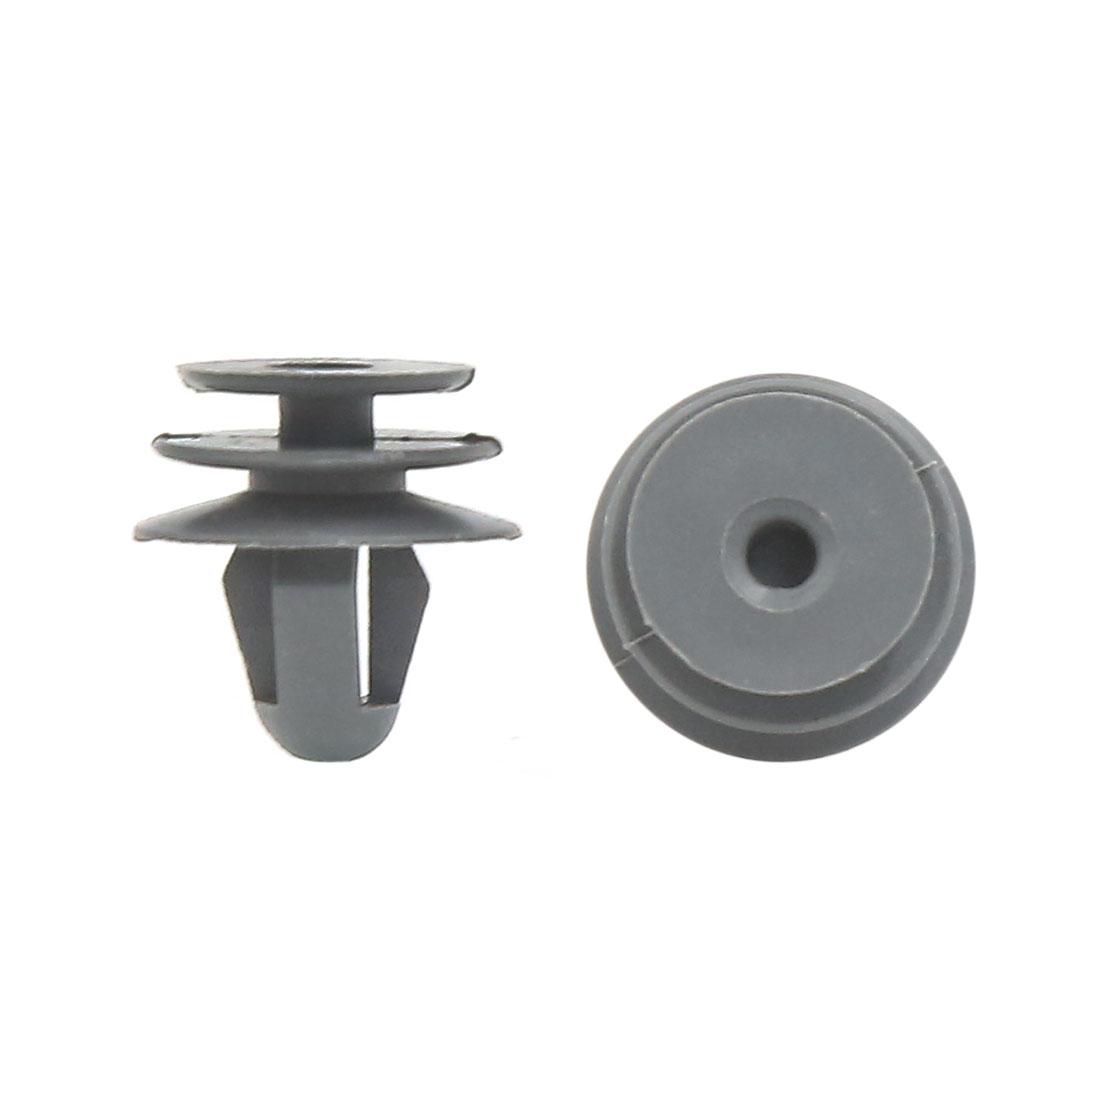 20 Pcs Gray Bumper Fender 8mm Hole Plastic Rivets Trim Fasteners for Car Auto